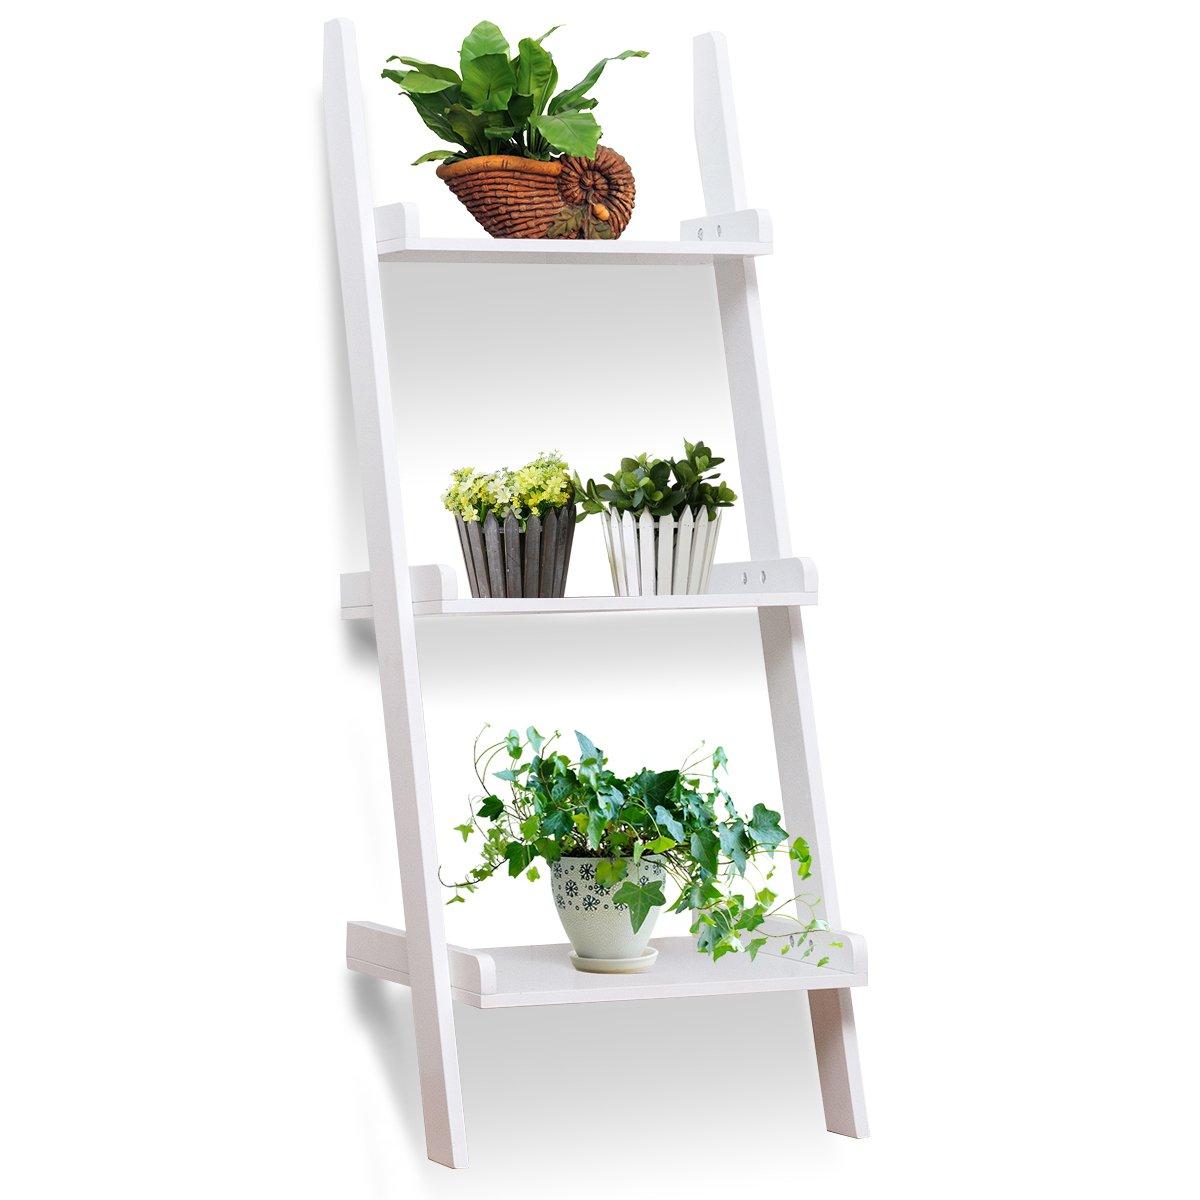 Giantex 3-Tier Leaning Wall Bookshelf Ladder Storage Display Bookcase Ladder Shelf Multipurpose Plant Flower Stand Shelf (White)